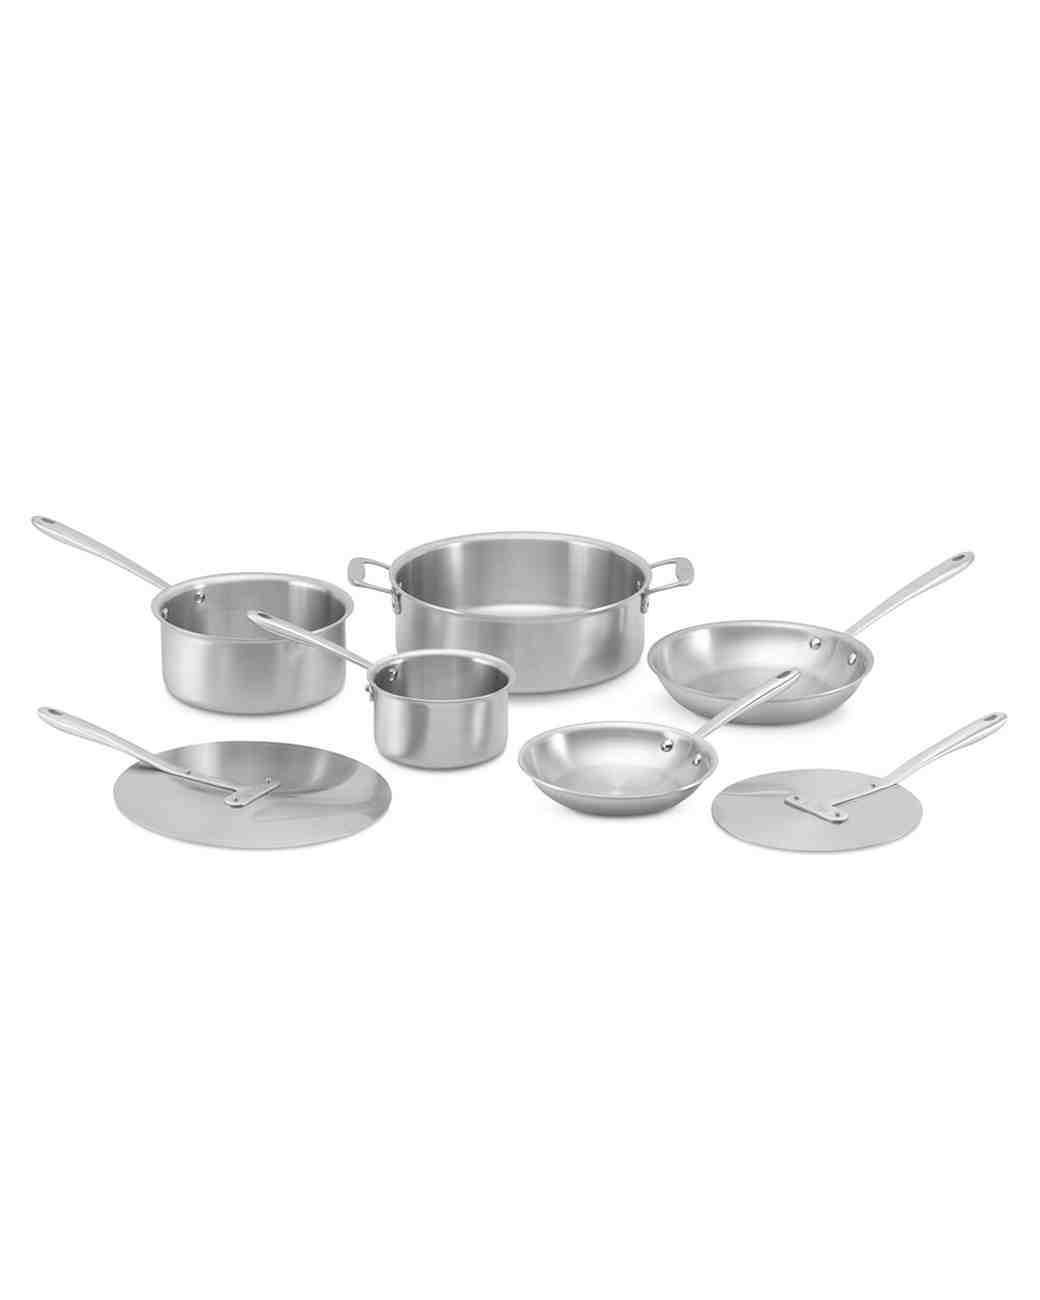 martha-bride-registry-tiler-peck-all-clad-pots-and-pans-cookware-0515.jpg